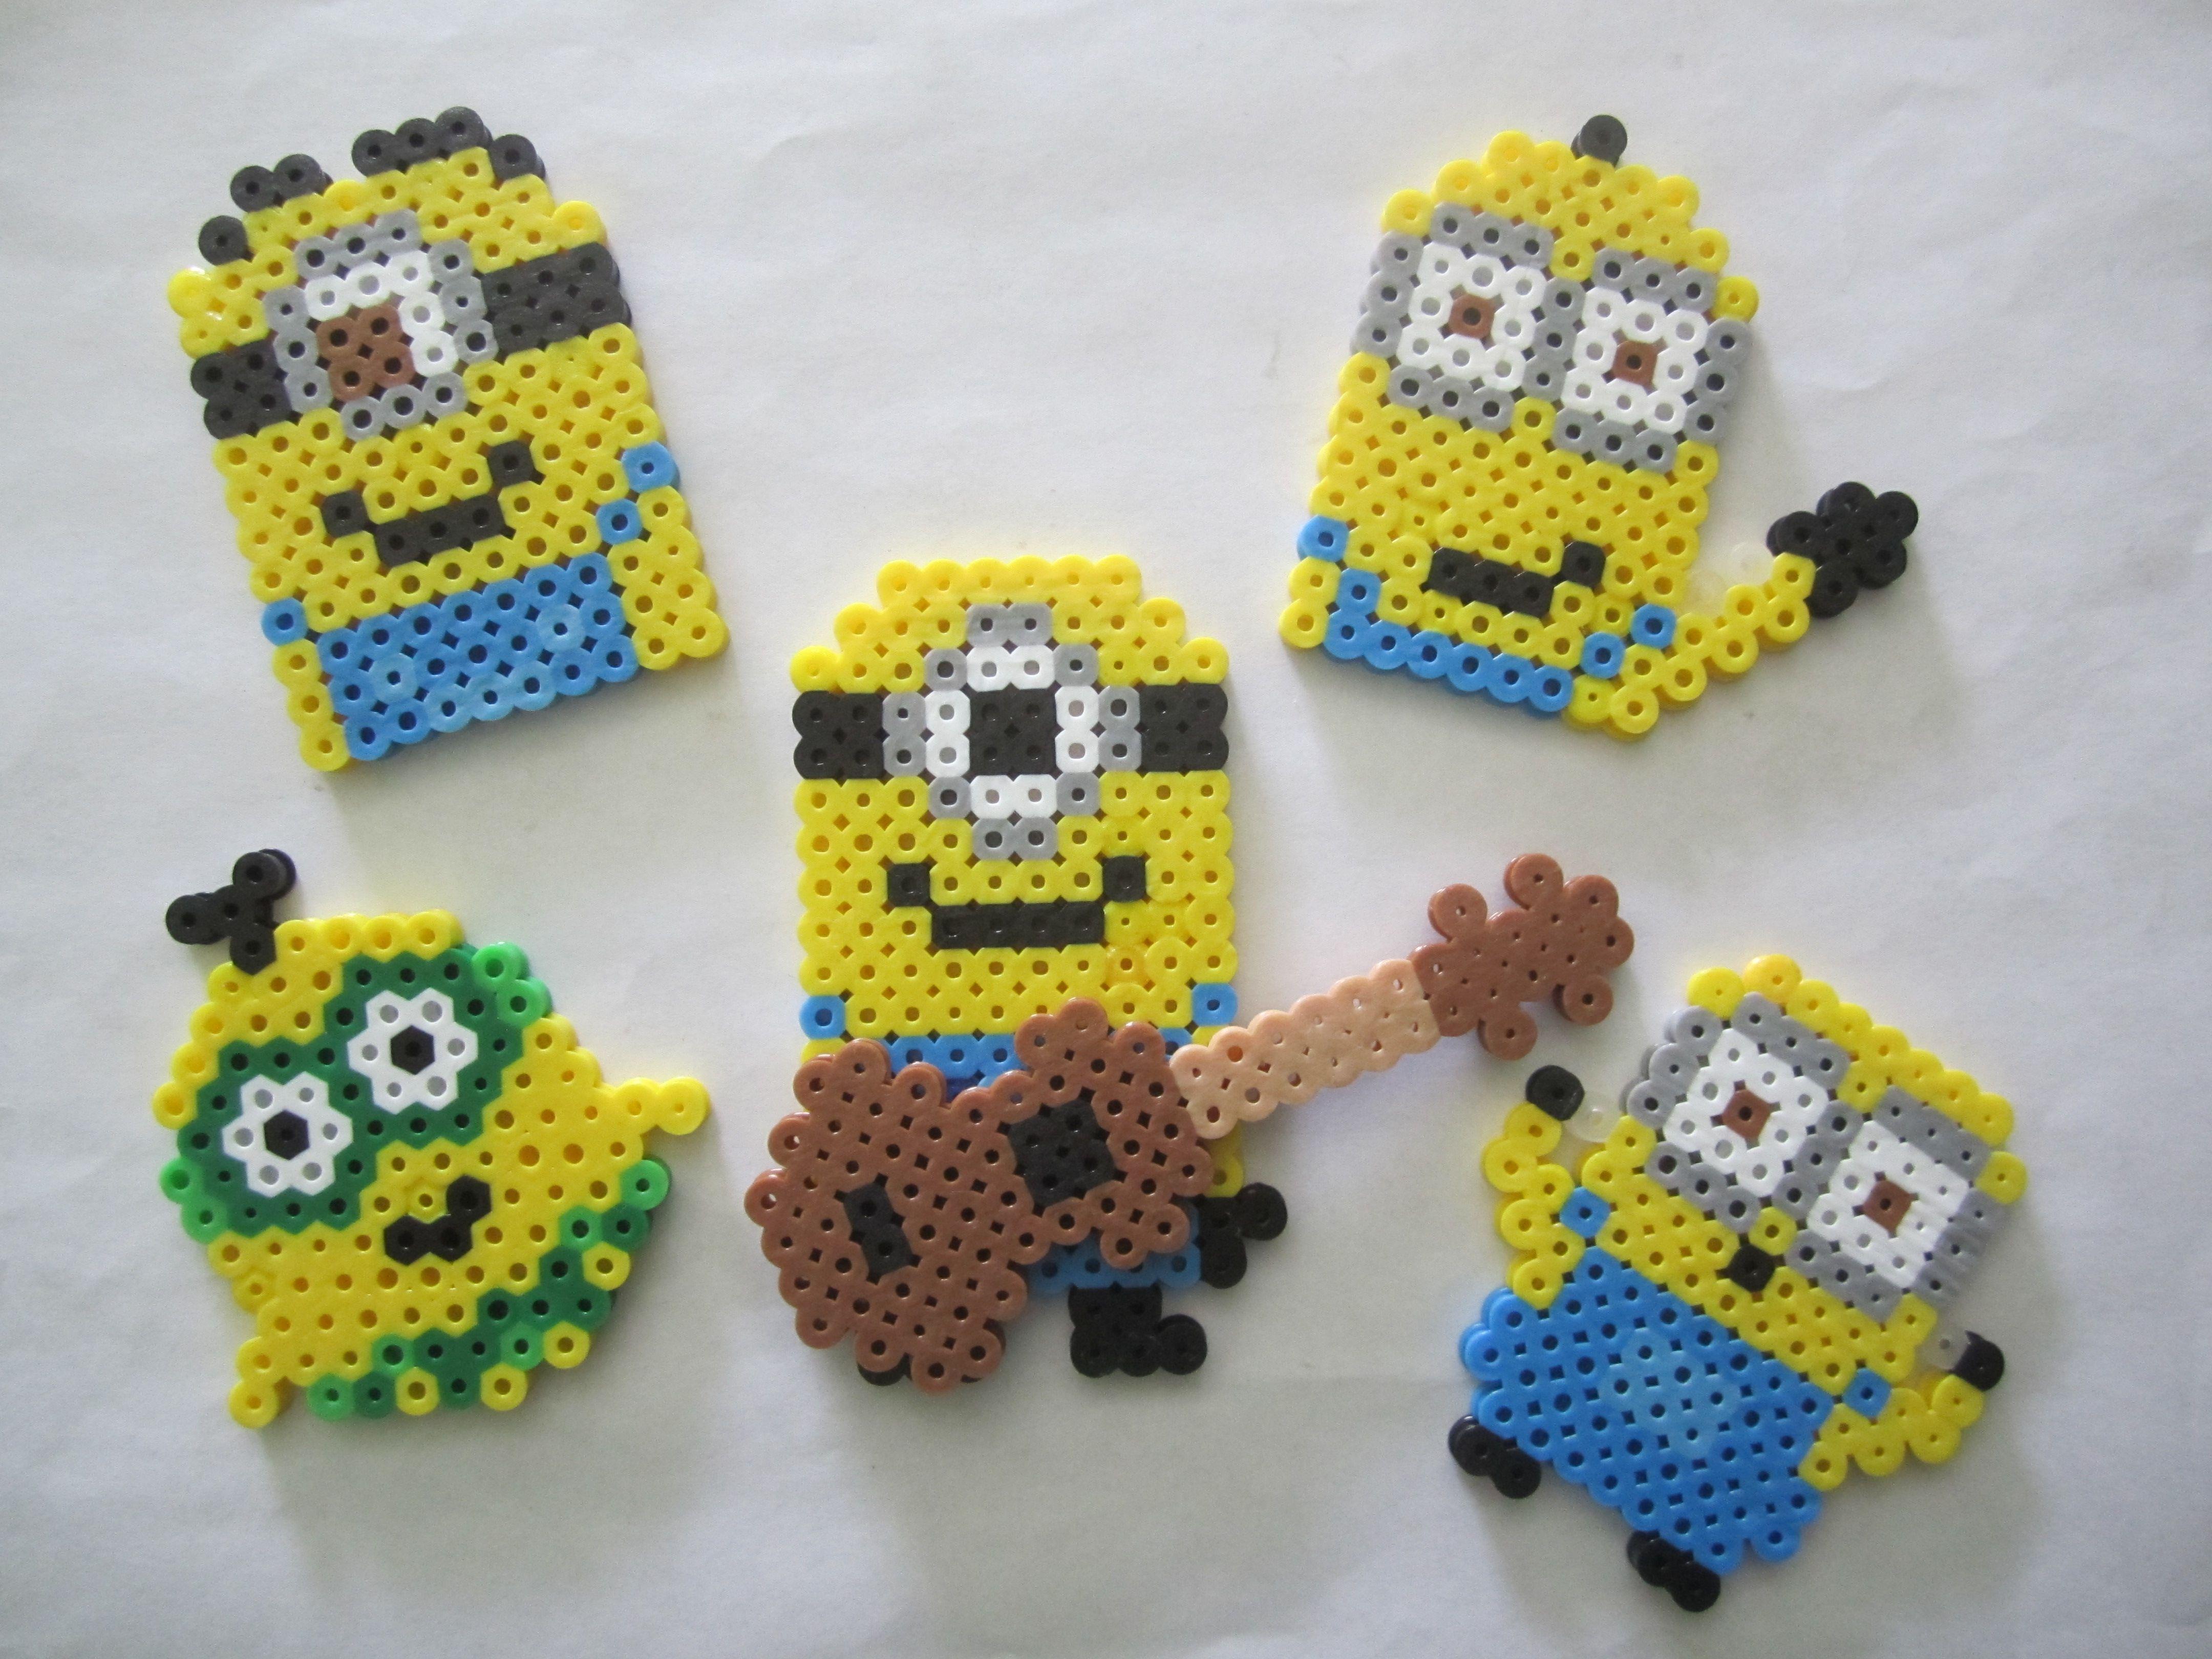 Assorted Minions perler beads by Angela Albergo